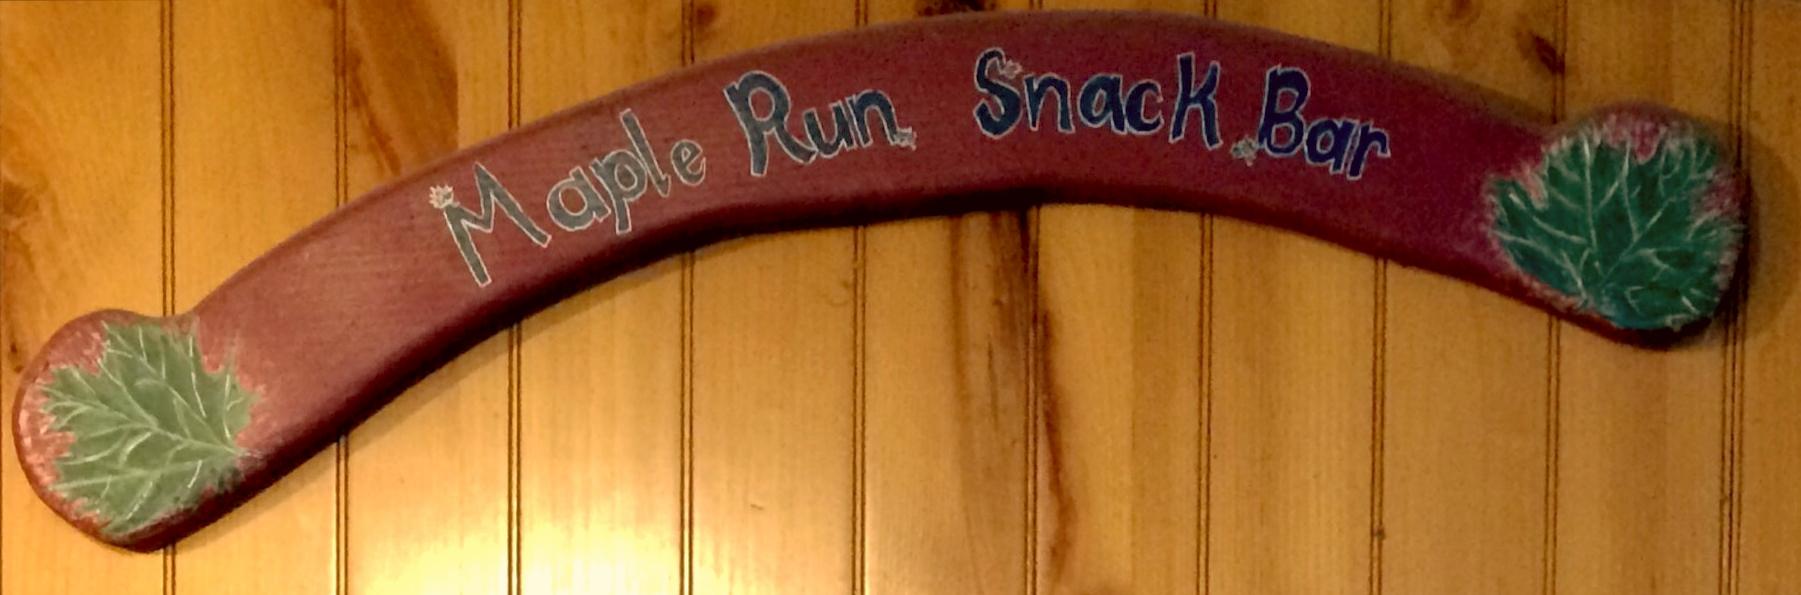 Snack Bar Sign.jpg